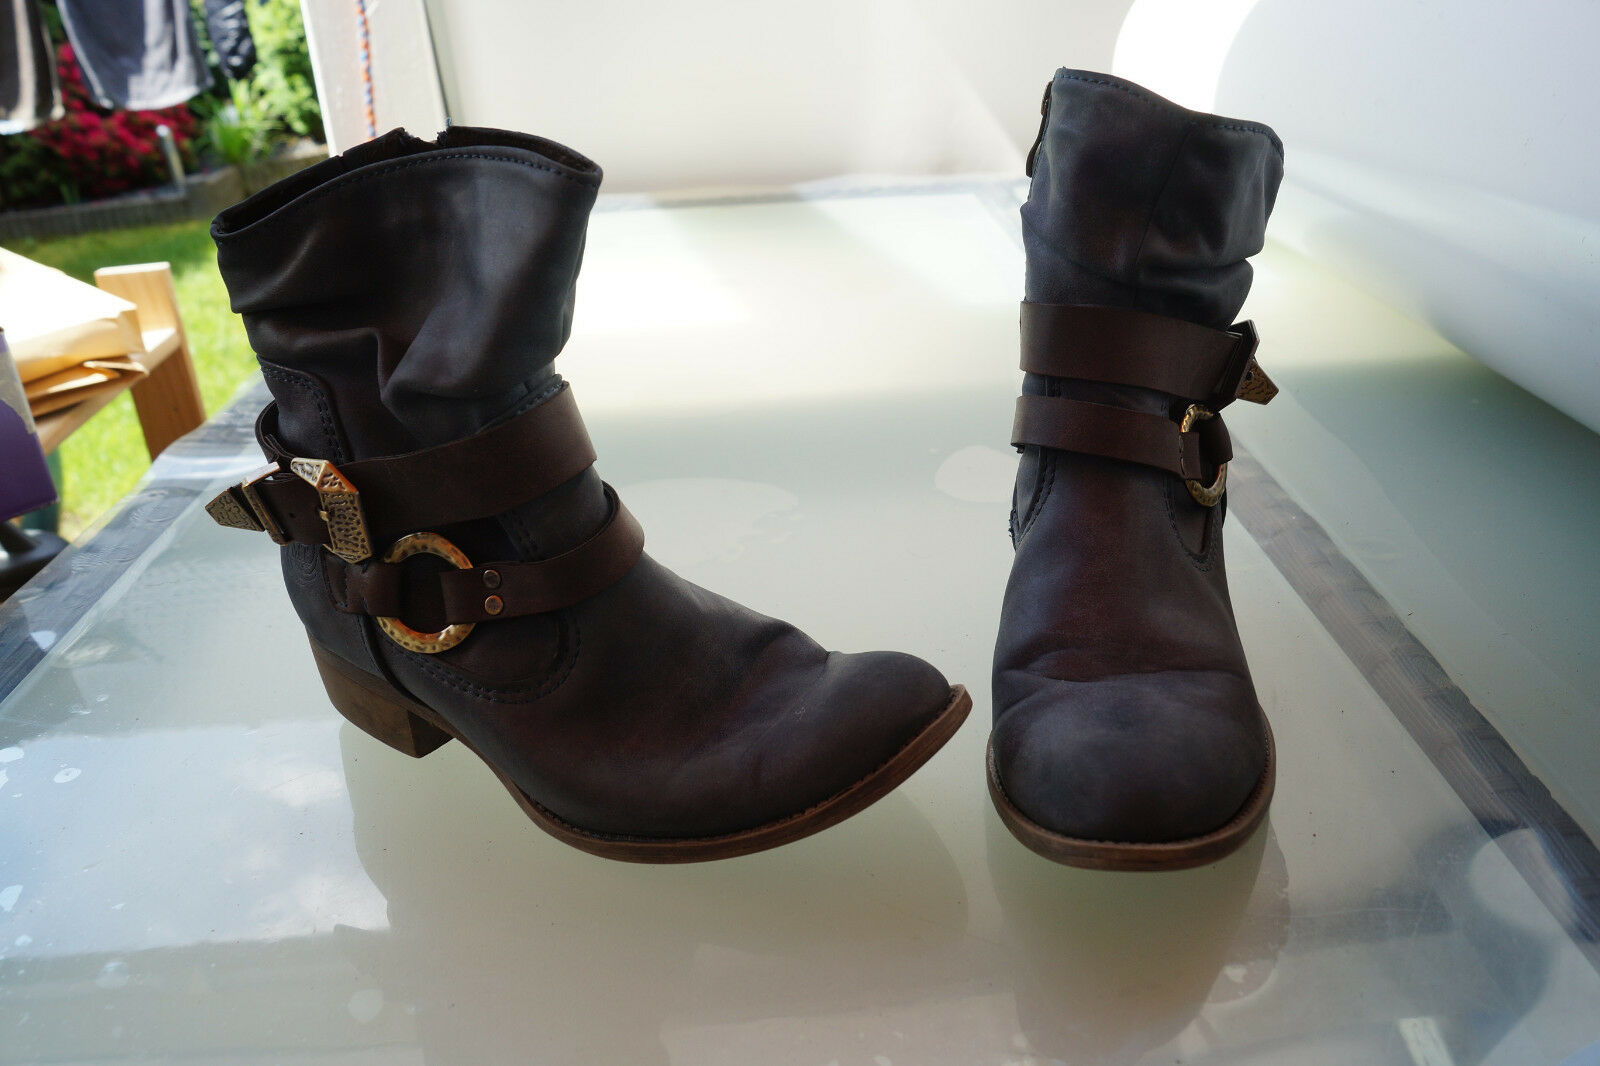 schicke MARCO TOZZI Damen Winter Schuhe Stiefel Boots Stiefeletten Gr.38 marine